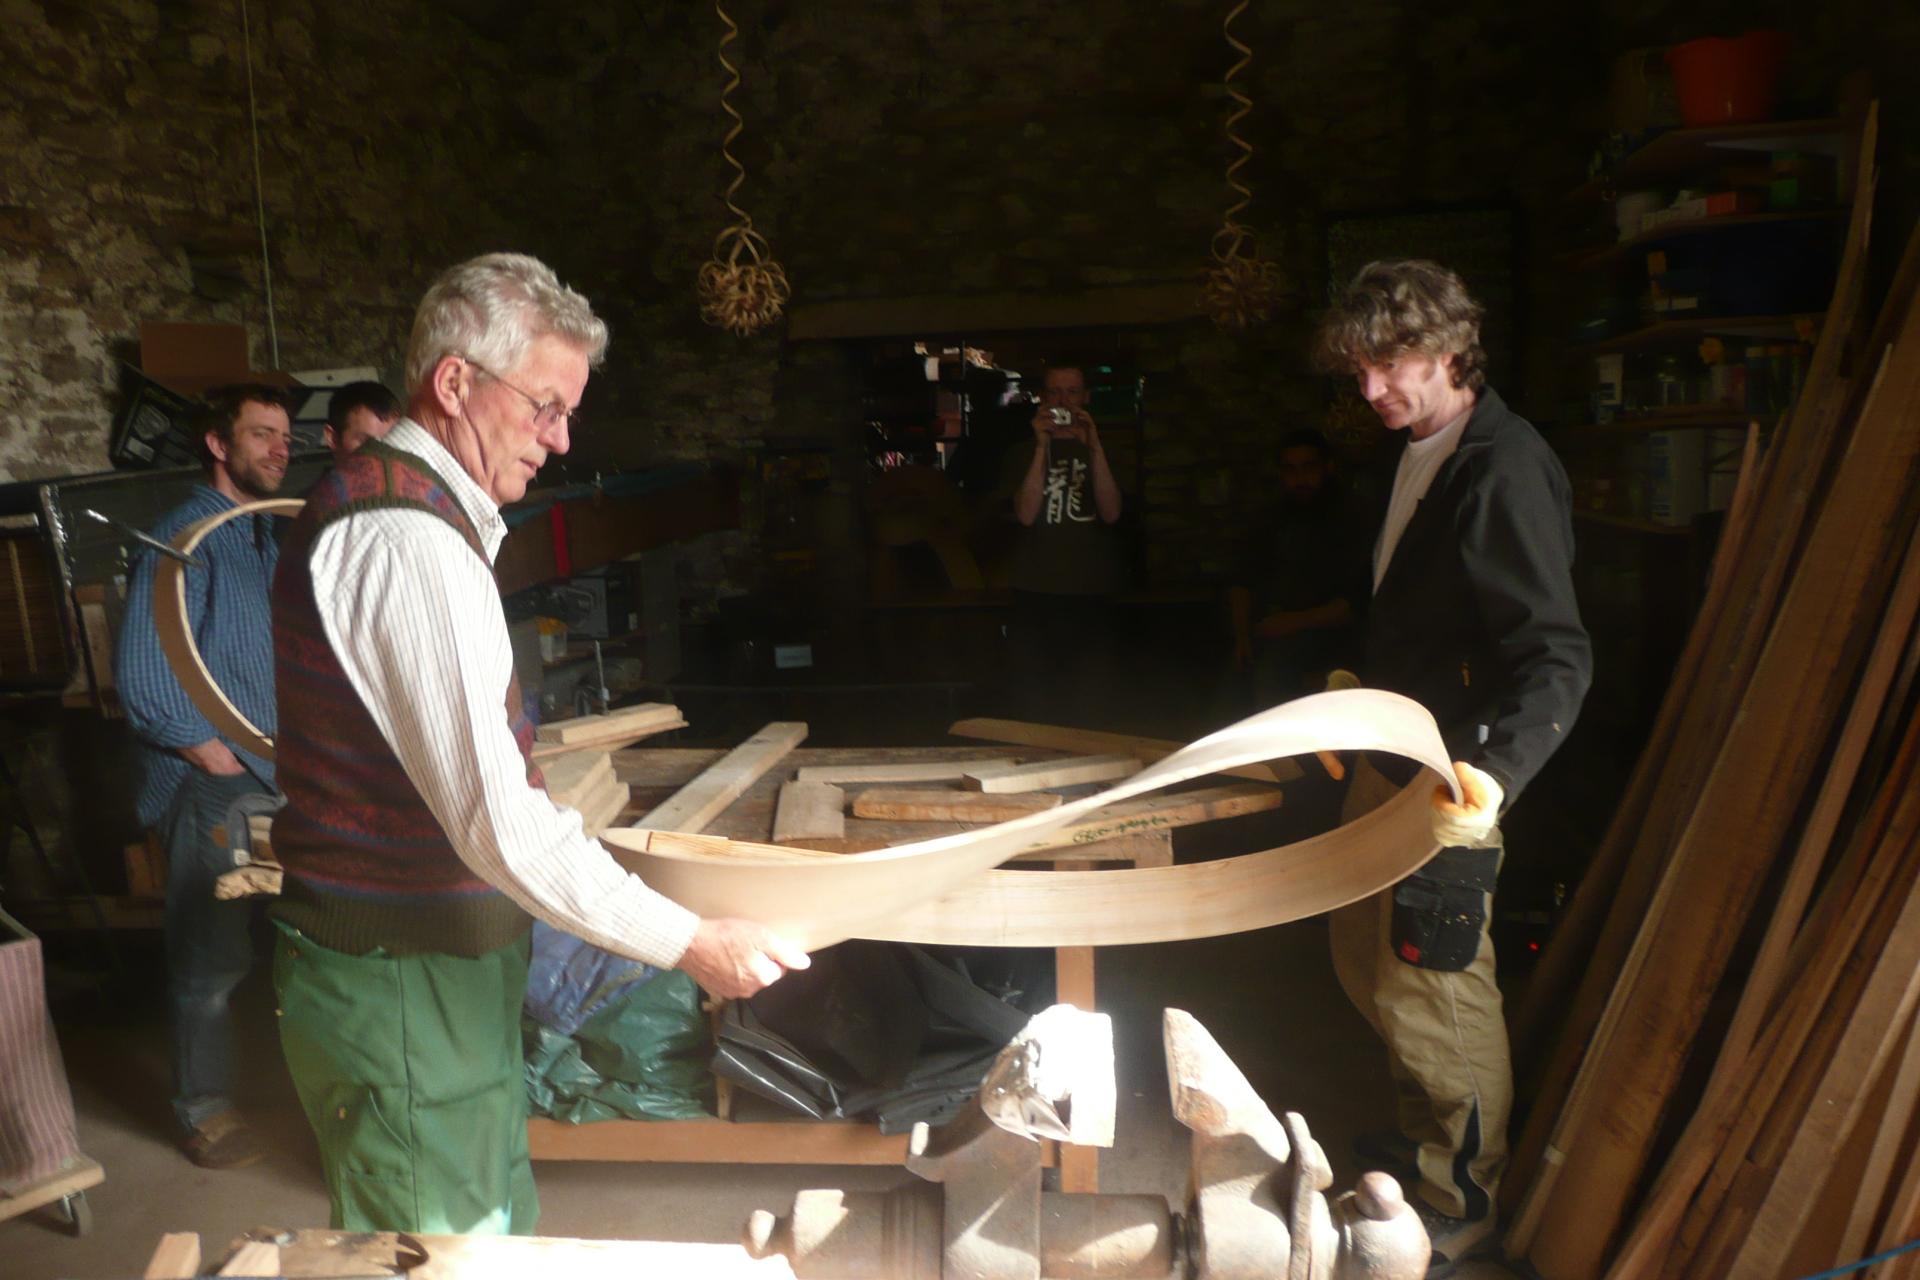 moebius strip, giant, stream-bent wood, steambending